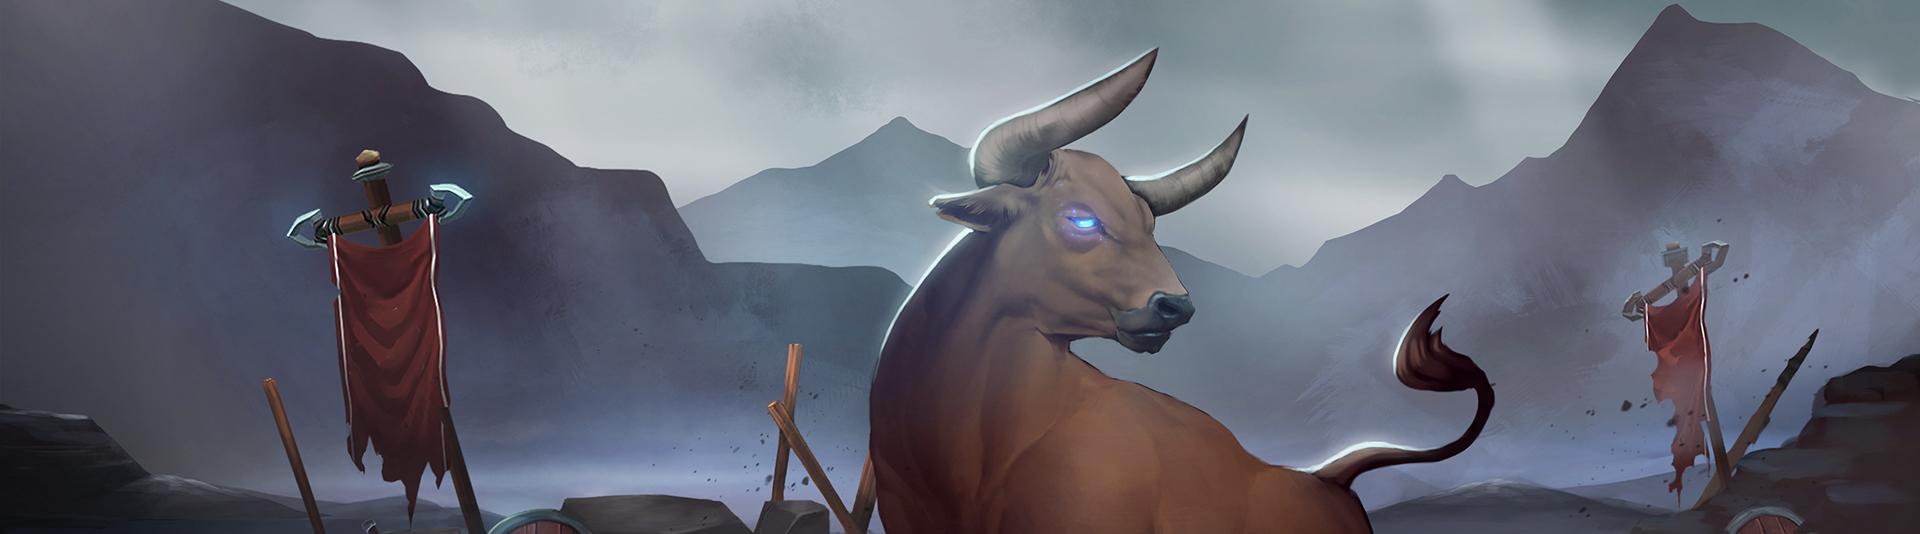 Northgard Clan of the Ox DLC